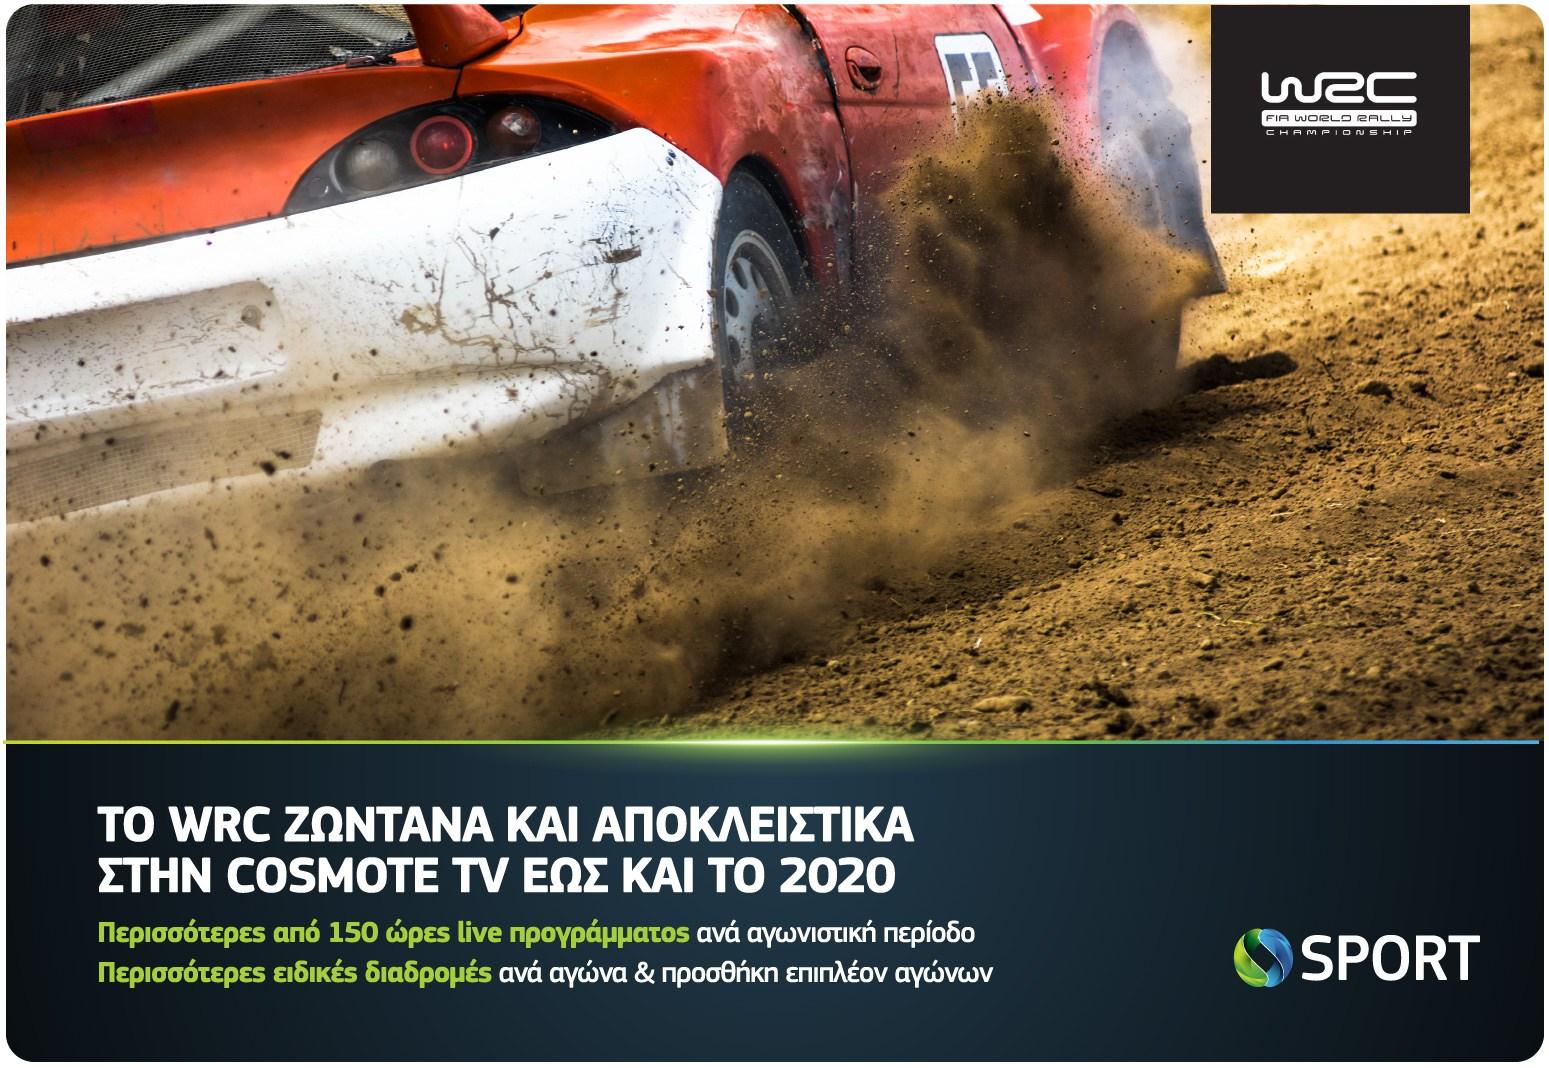 COSMOTE TV: Το WRC ζωντανά και αποκλειστικά στα κανάλια COSMOTE SPORT έως και το 2020